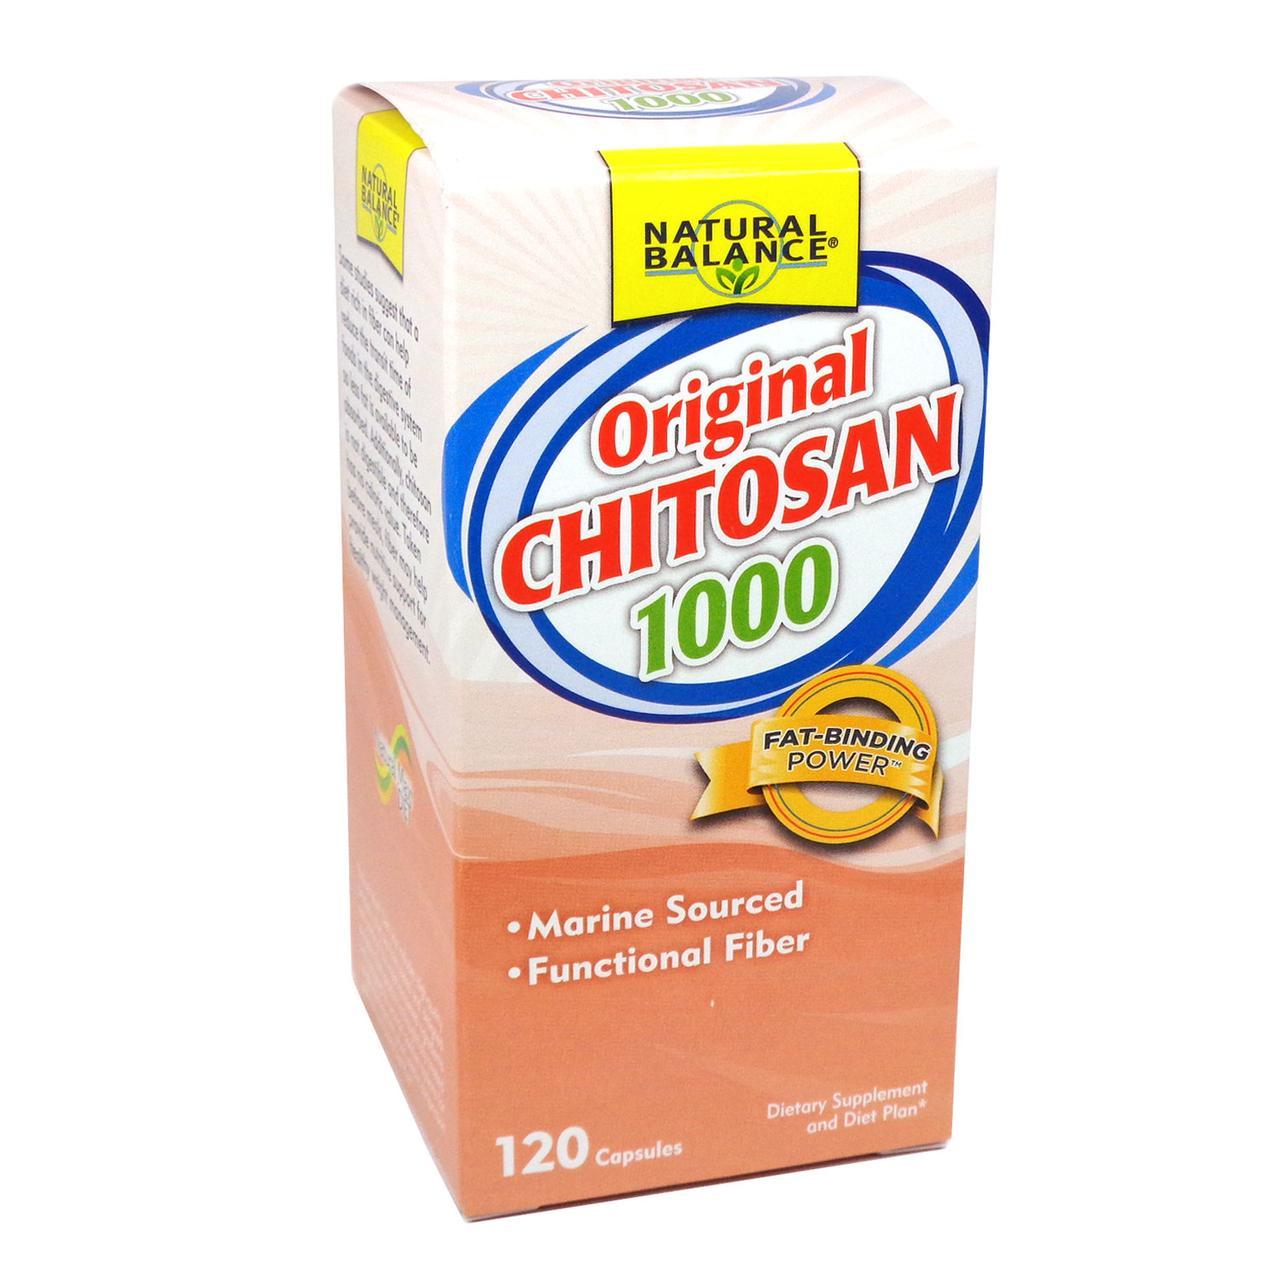 Хитозан, Natural Balance, 1000 мг, 120 капсул